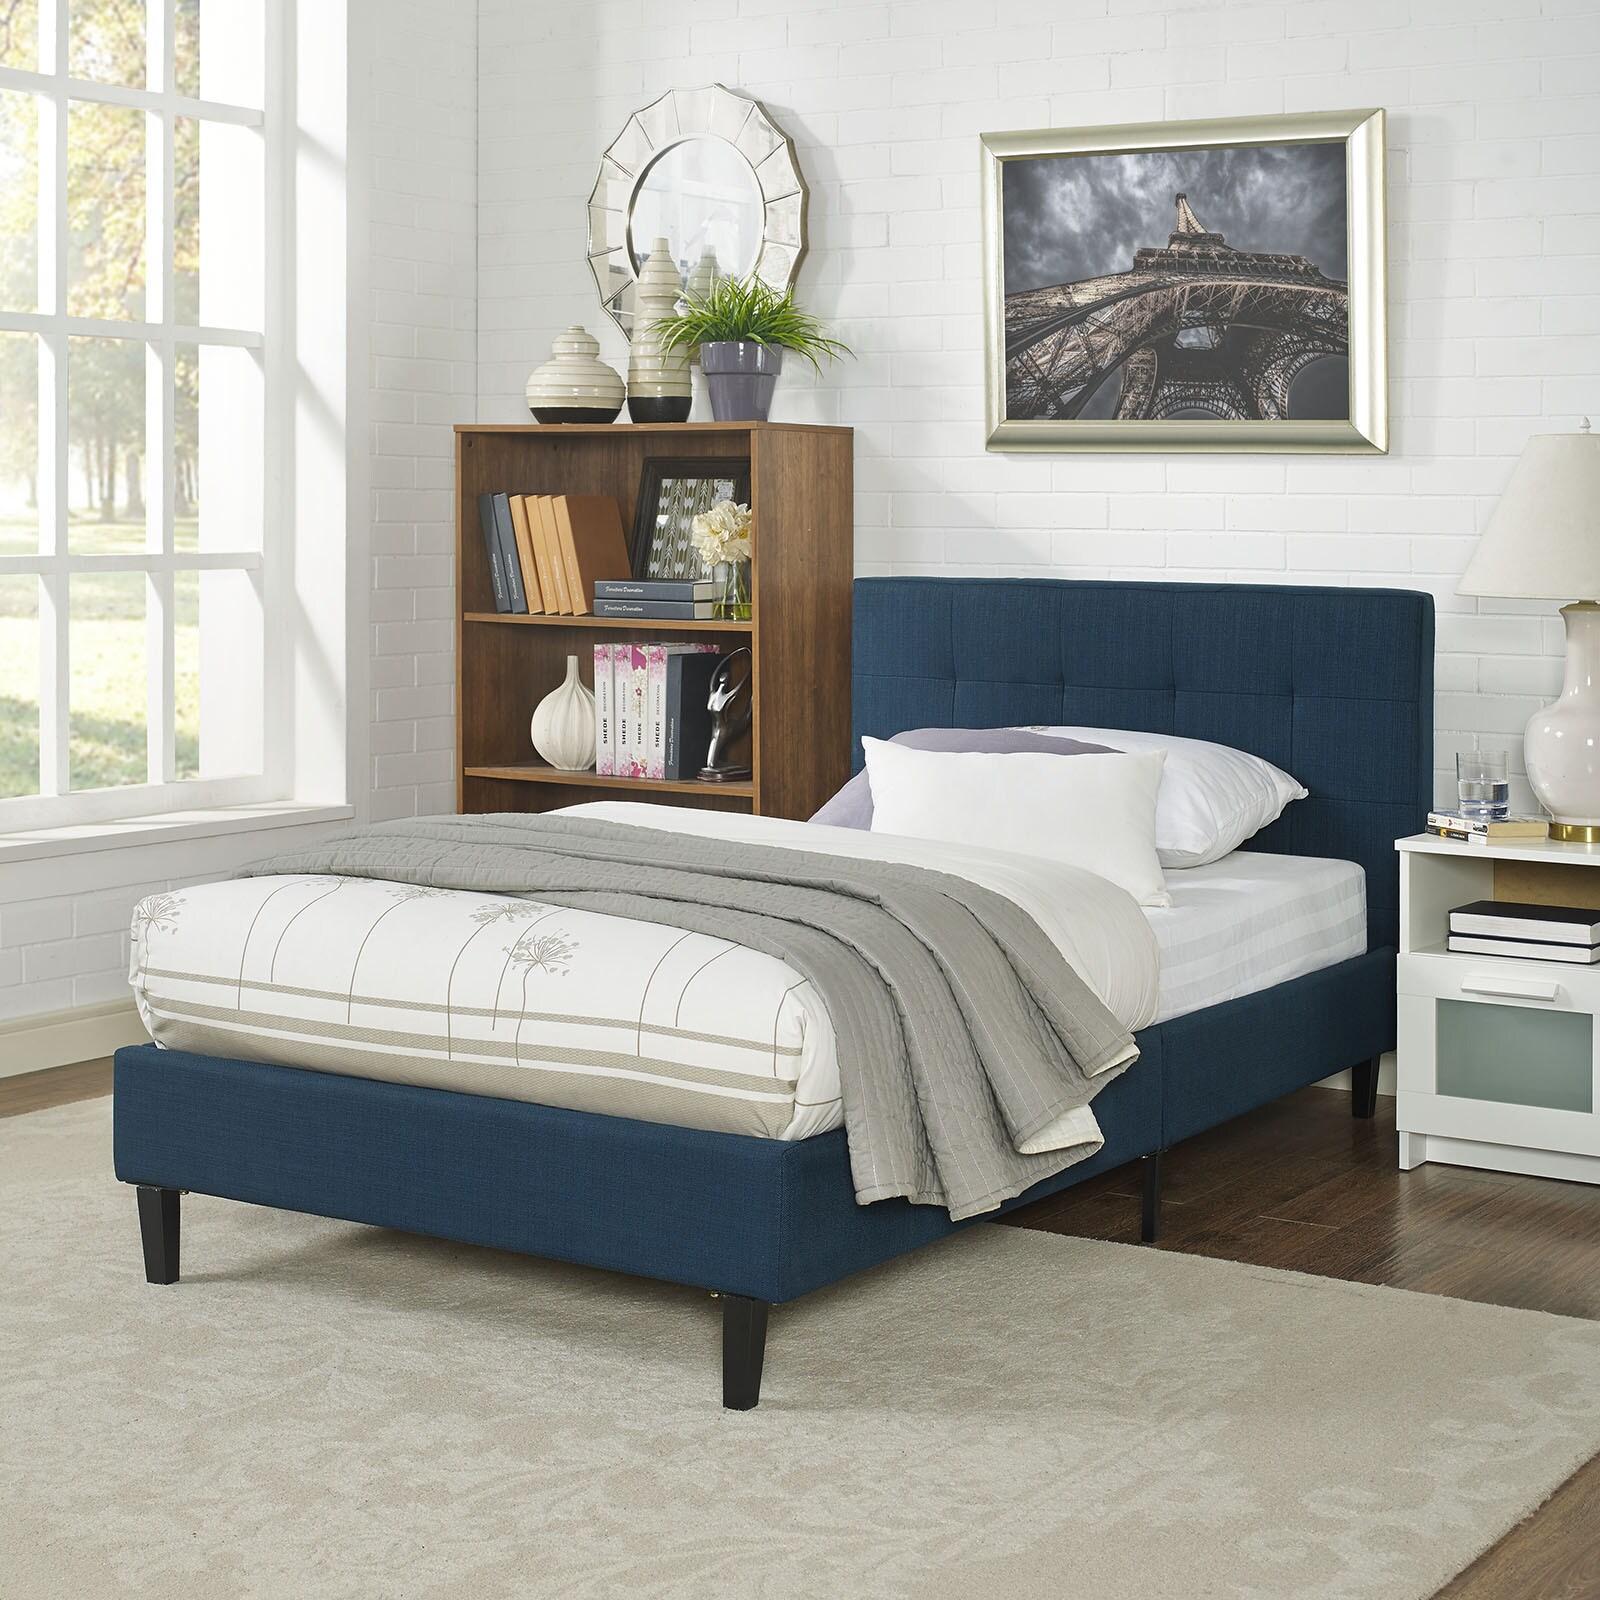 Modway Linnea Kids Greyoff White Polyester Upholstered Platform Bed Frame